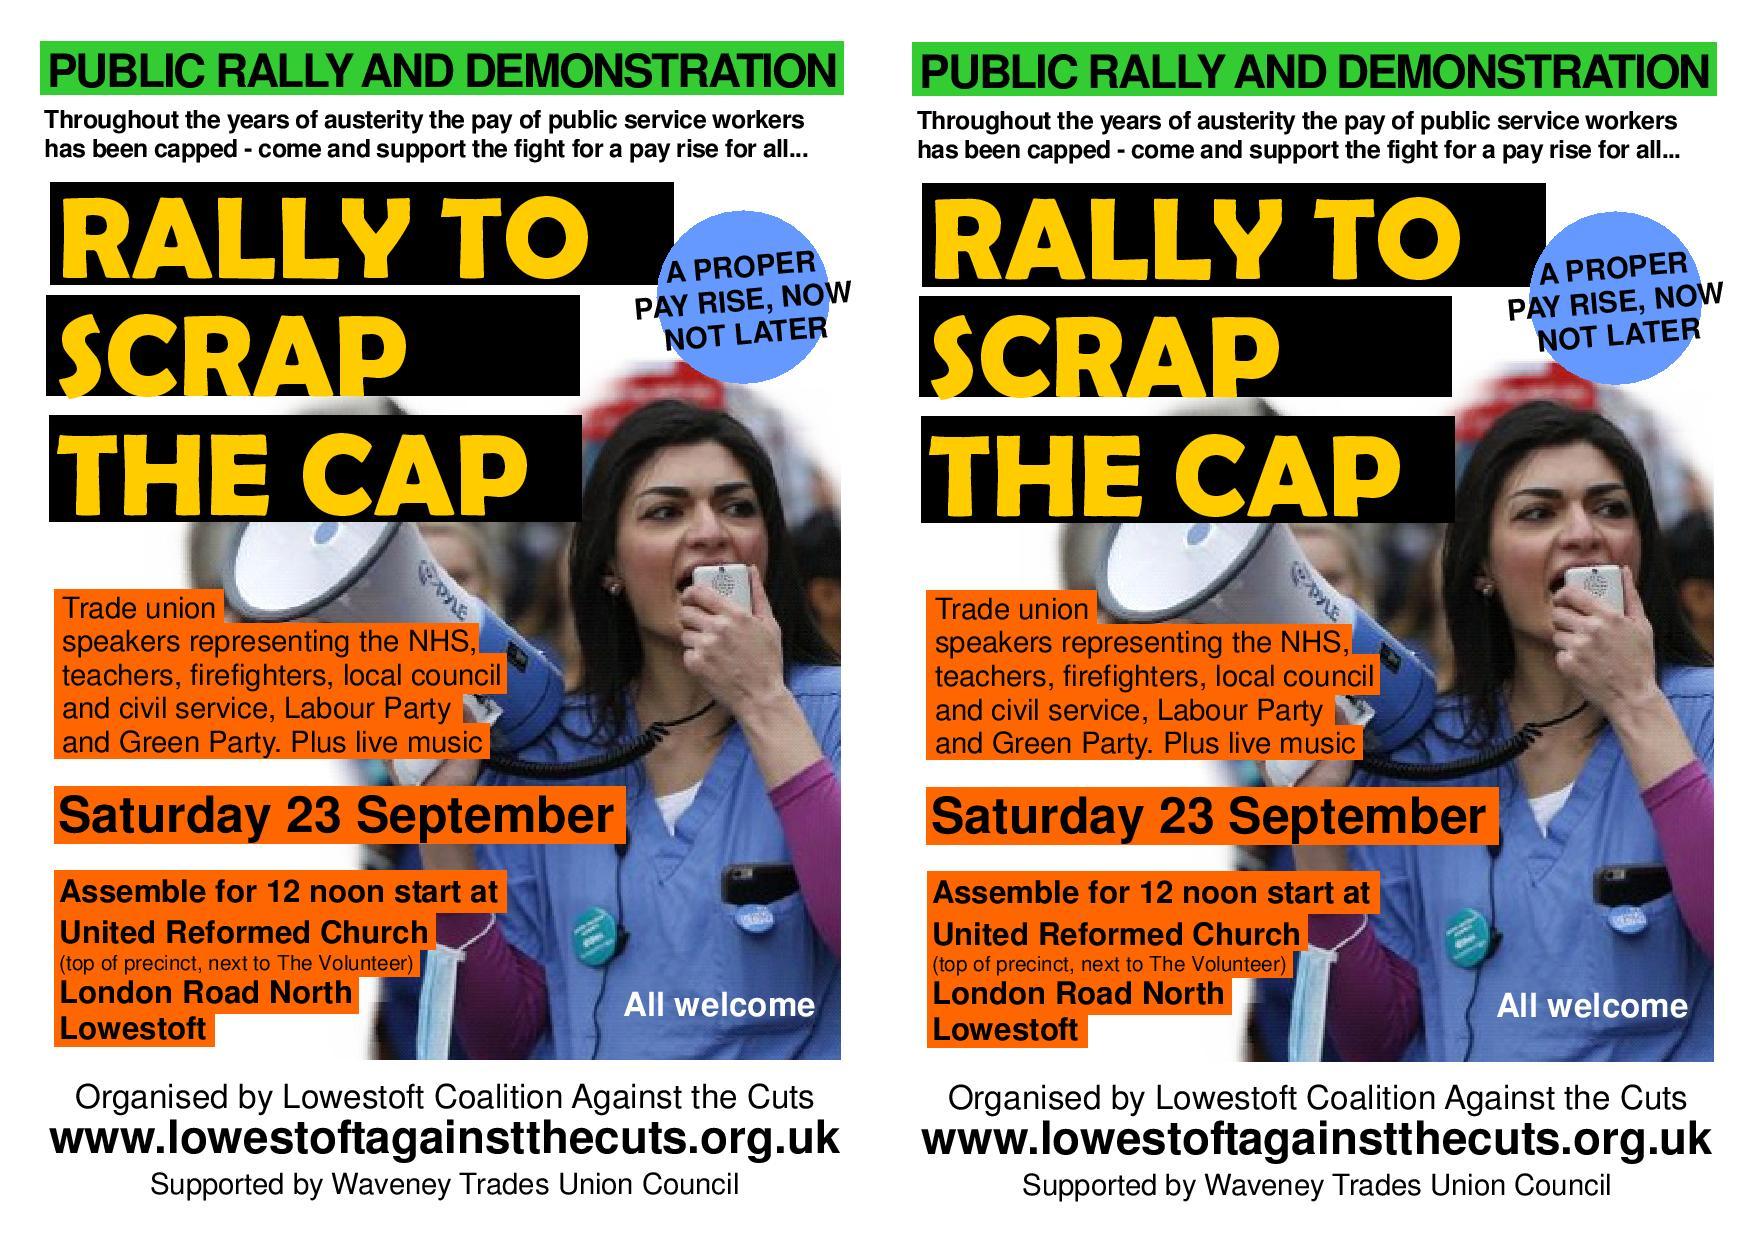 Scrap_the_Cap_rally_23.09.17.jpg